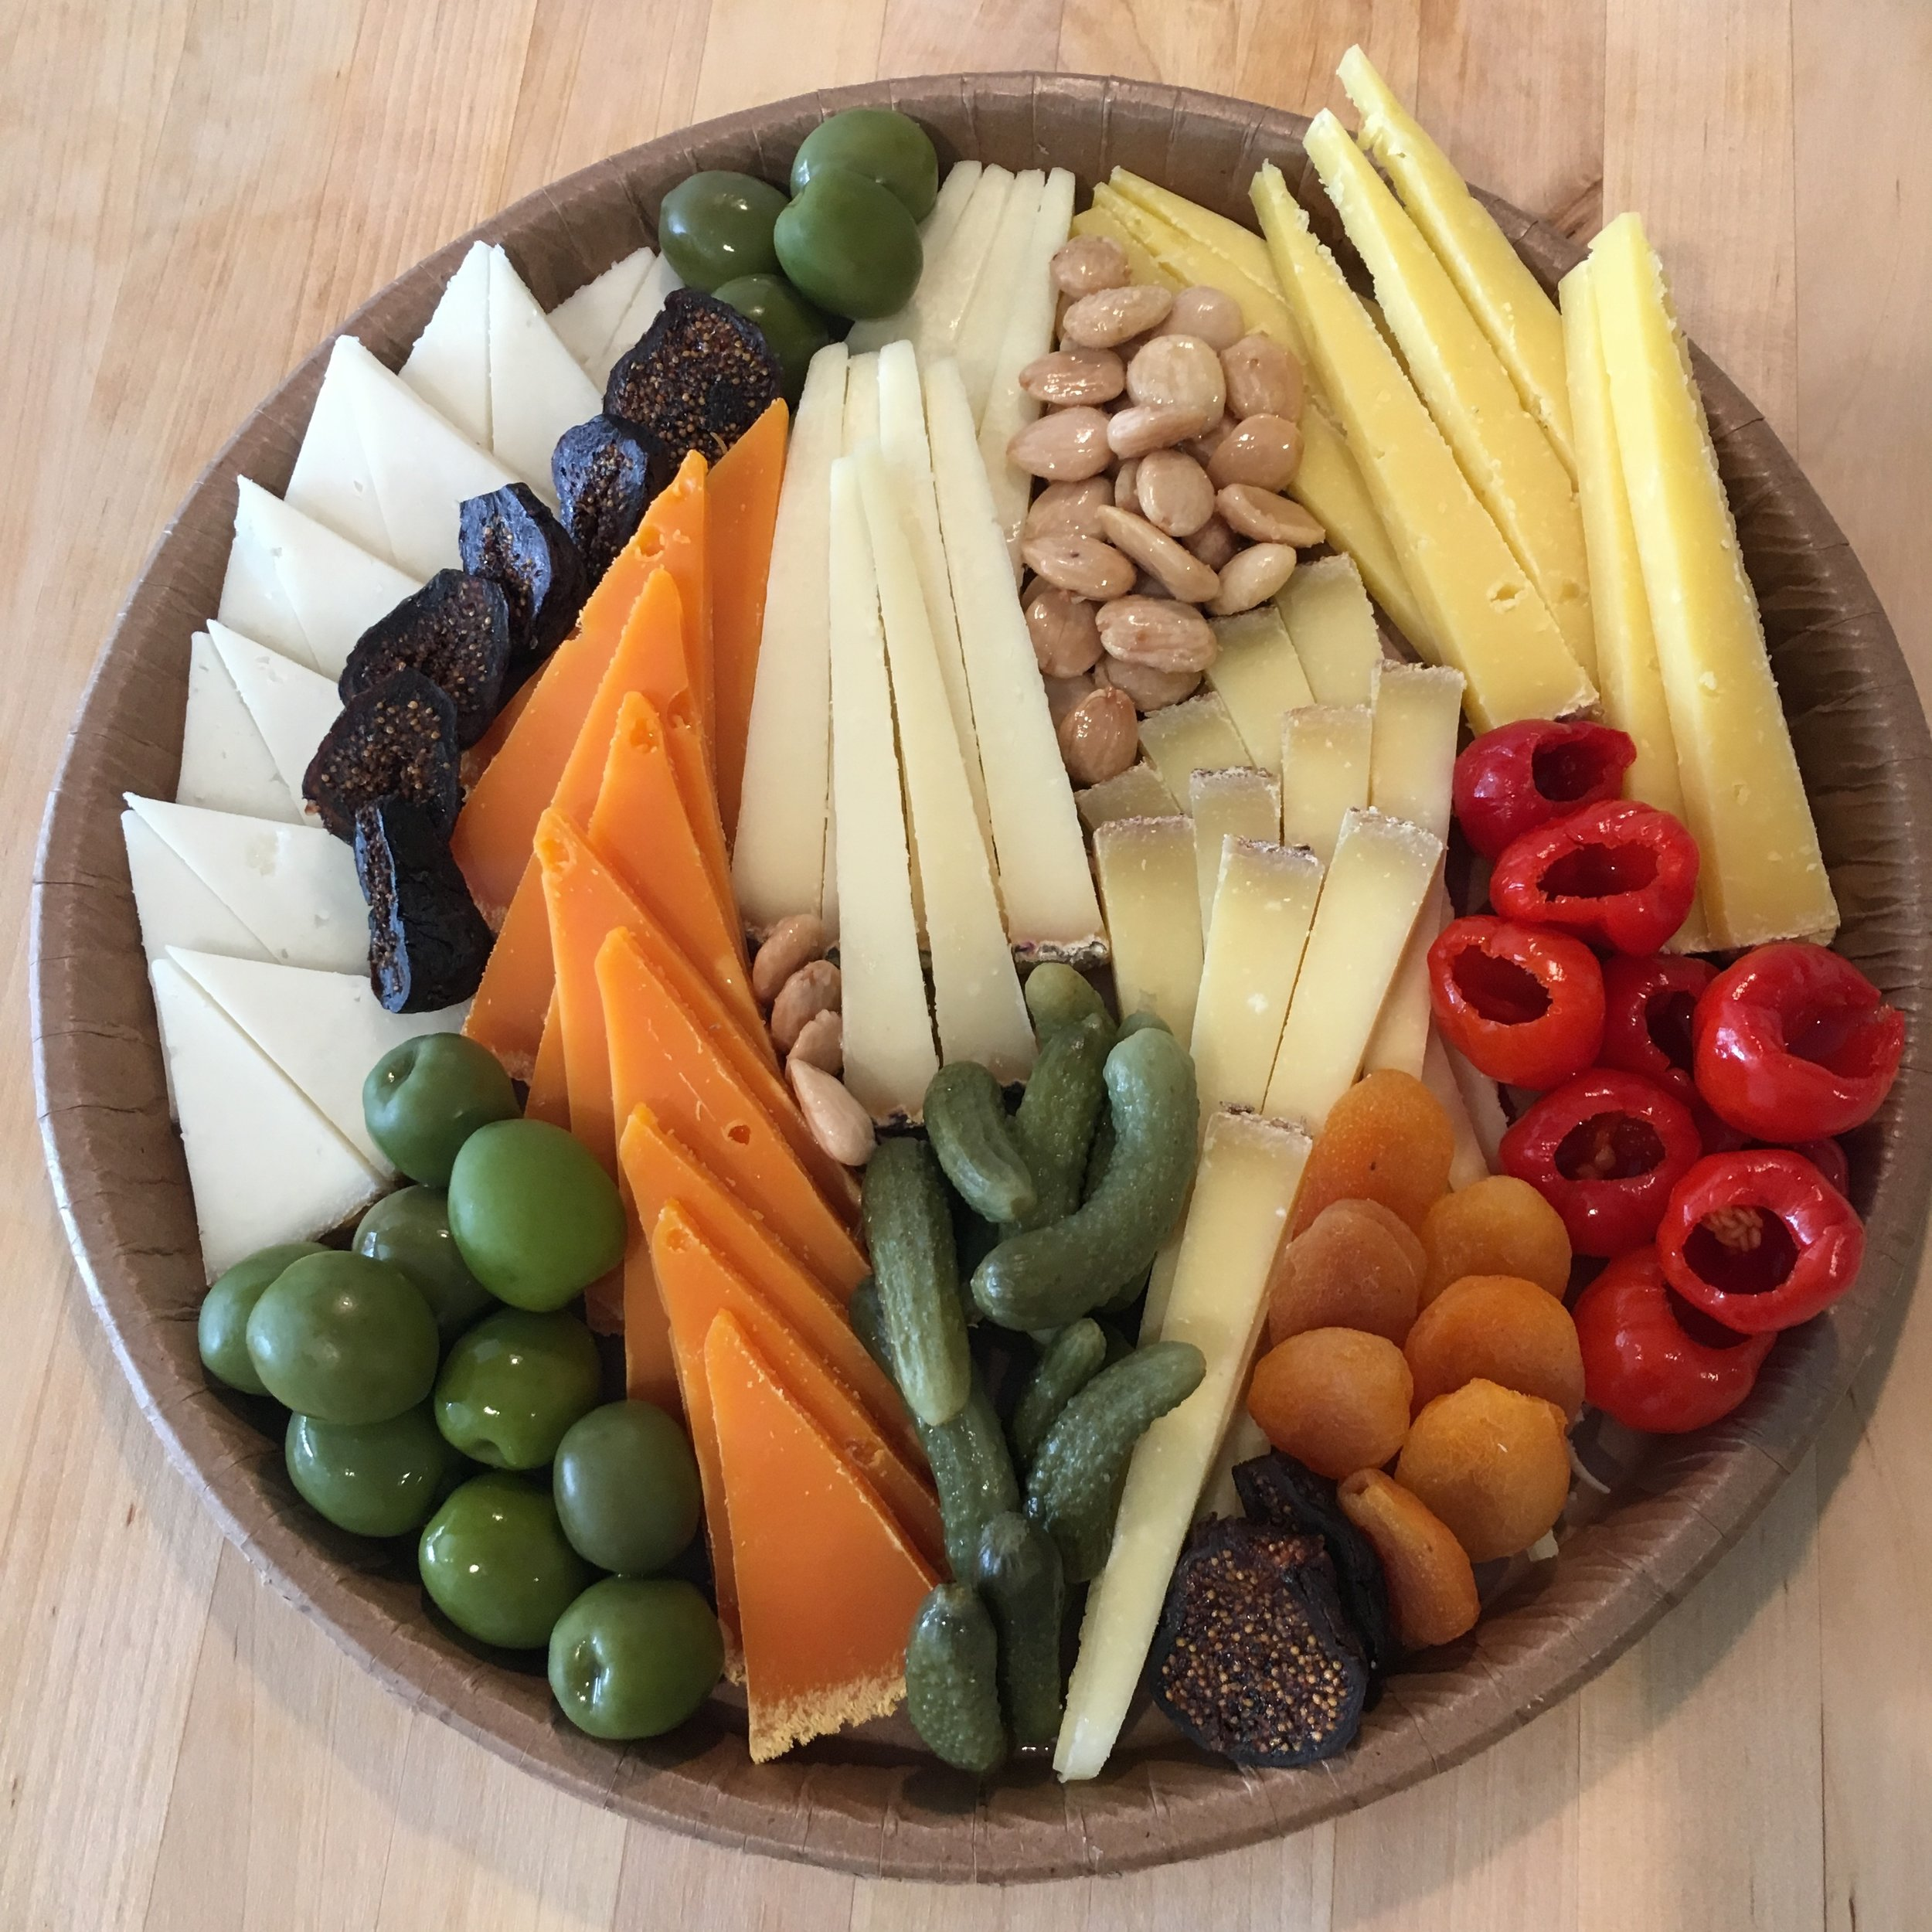 10 person board, all cheese